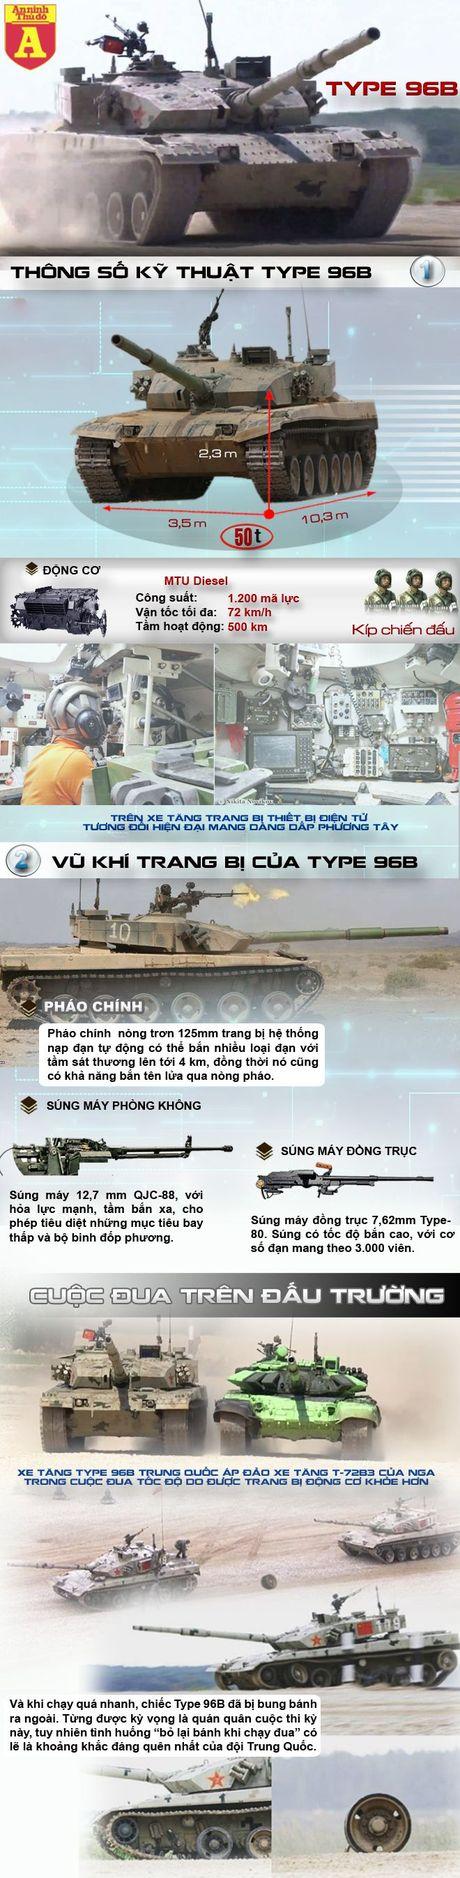 Noi xau ho mang ten Sieu tang Type 96B - Anh 1